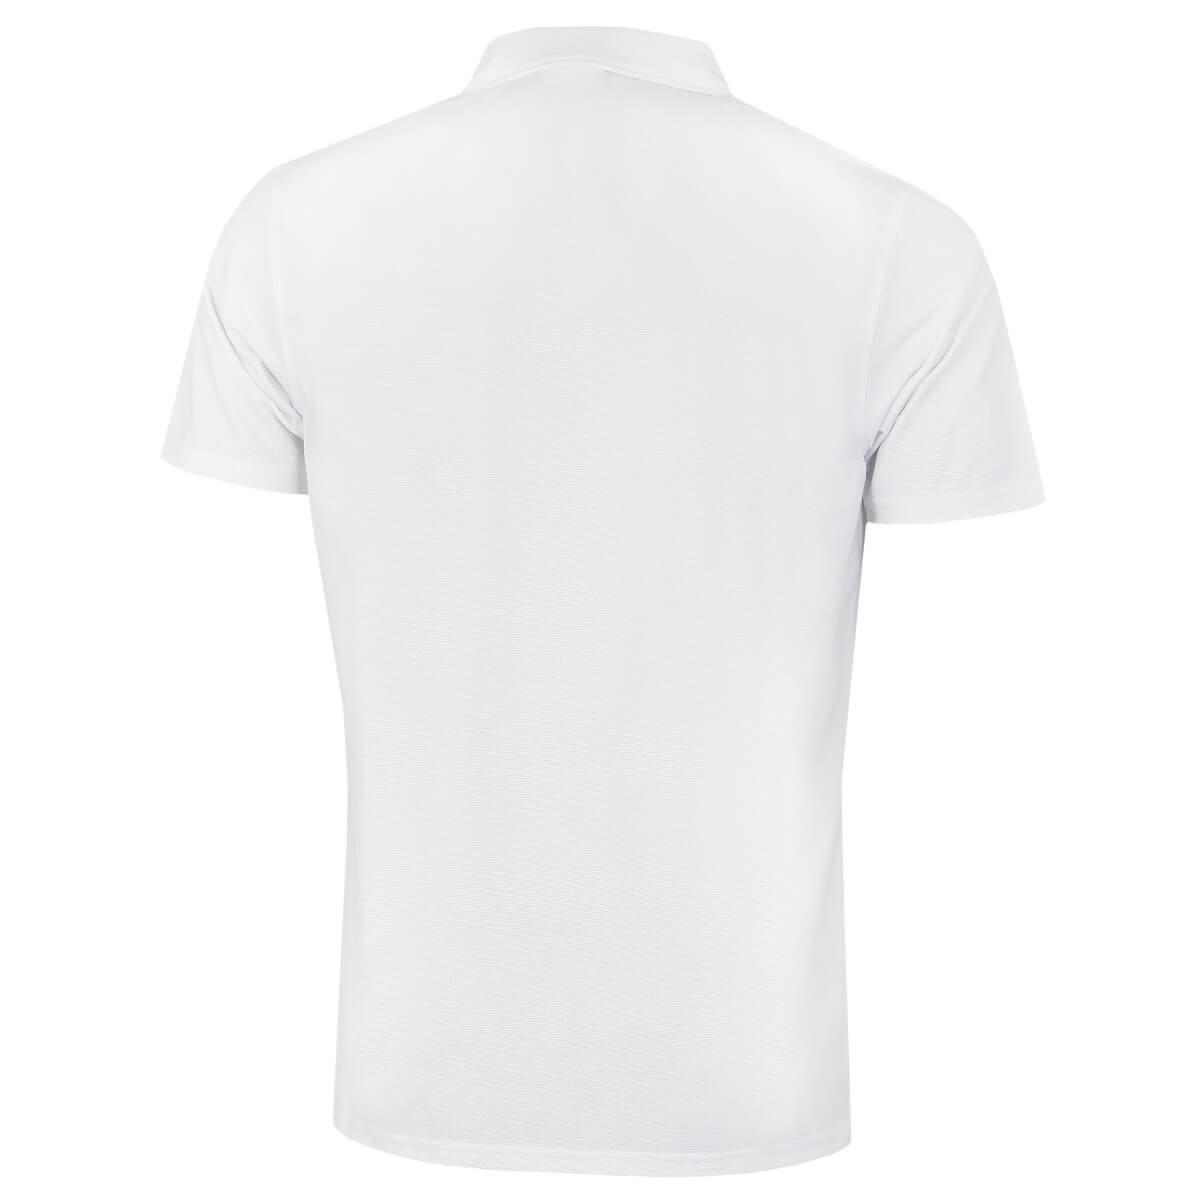 thumbnail 18 - Calvin Klein Mens 2021 Central Eco Light Wicking Golf Polo Shirt 28% OFF RRP